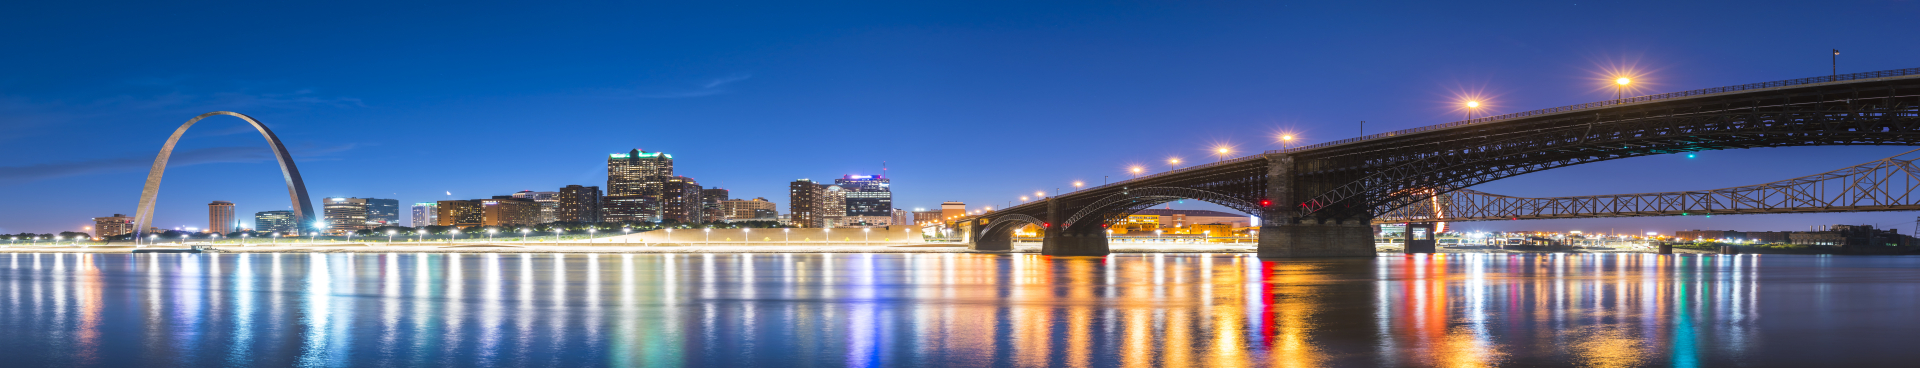 St. Louis panoramic resized